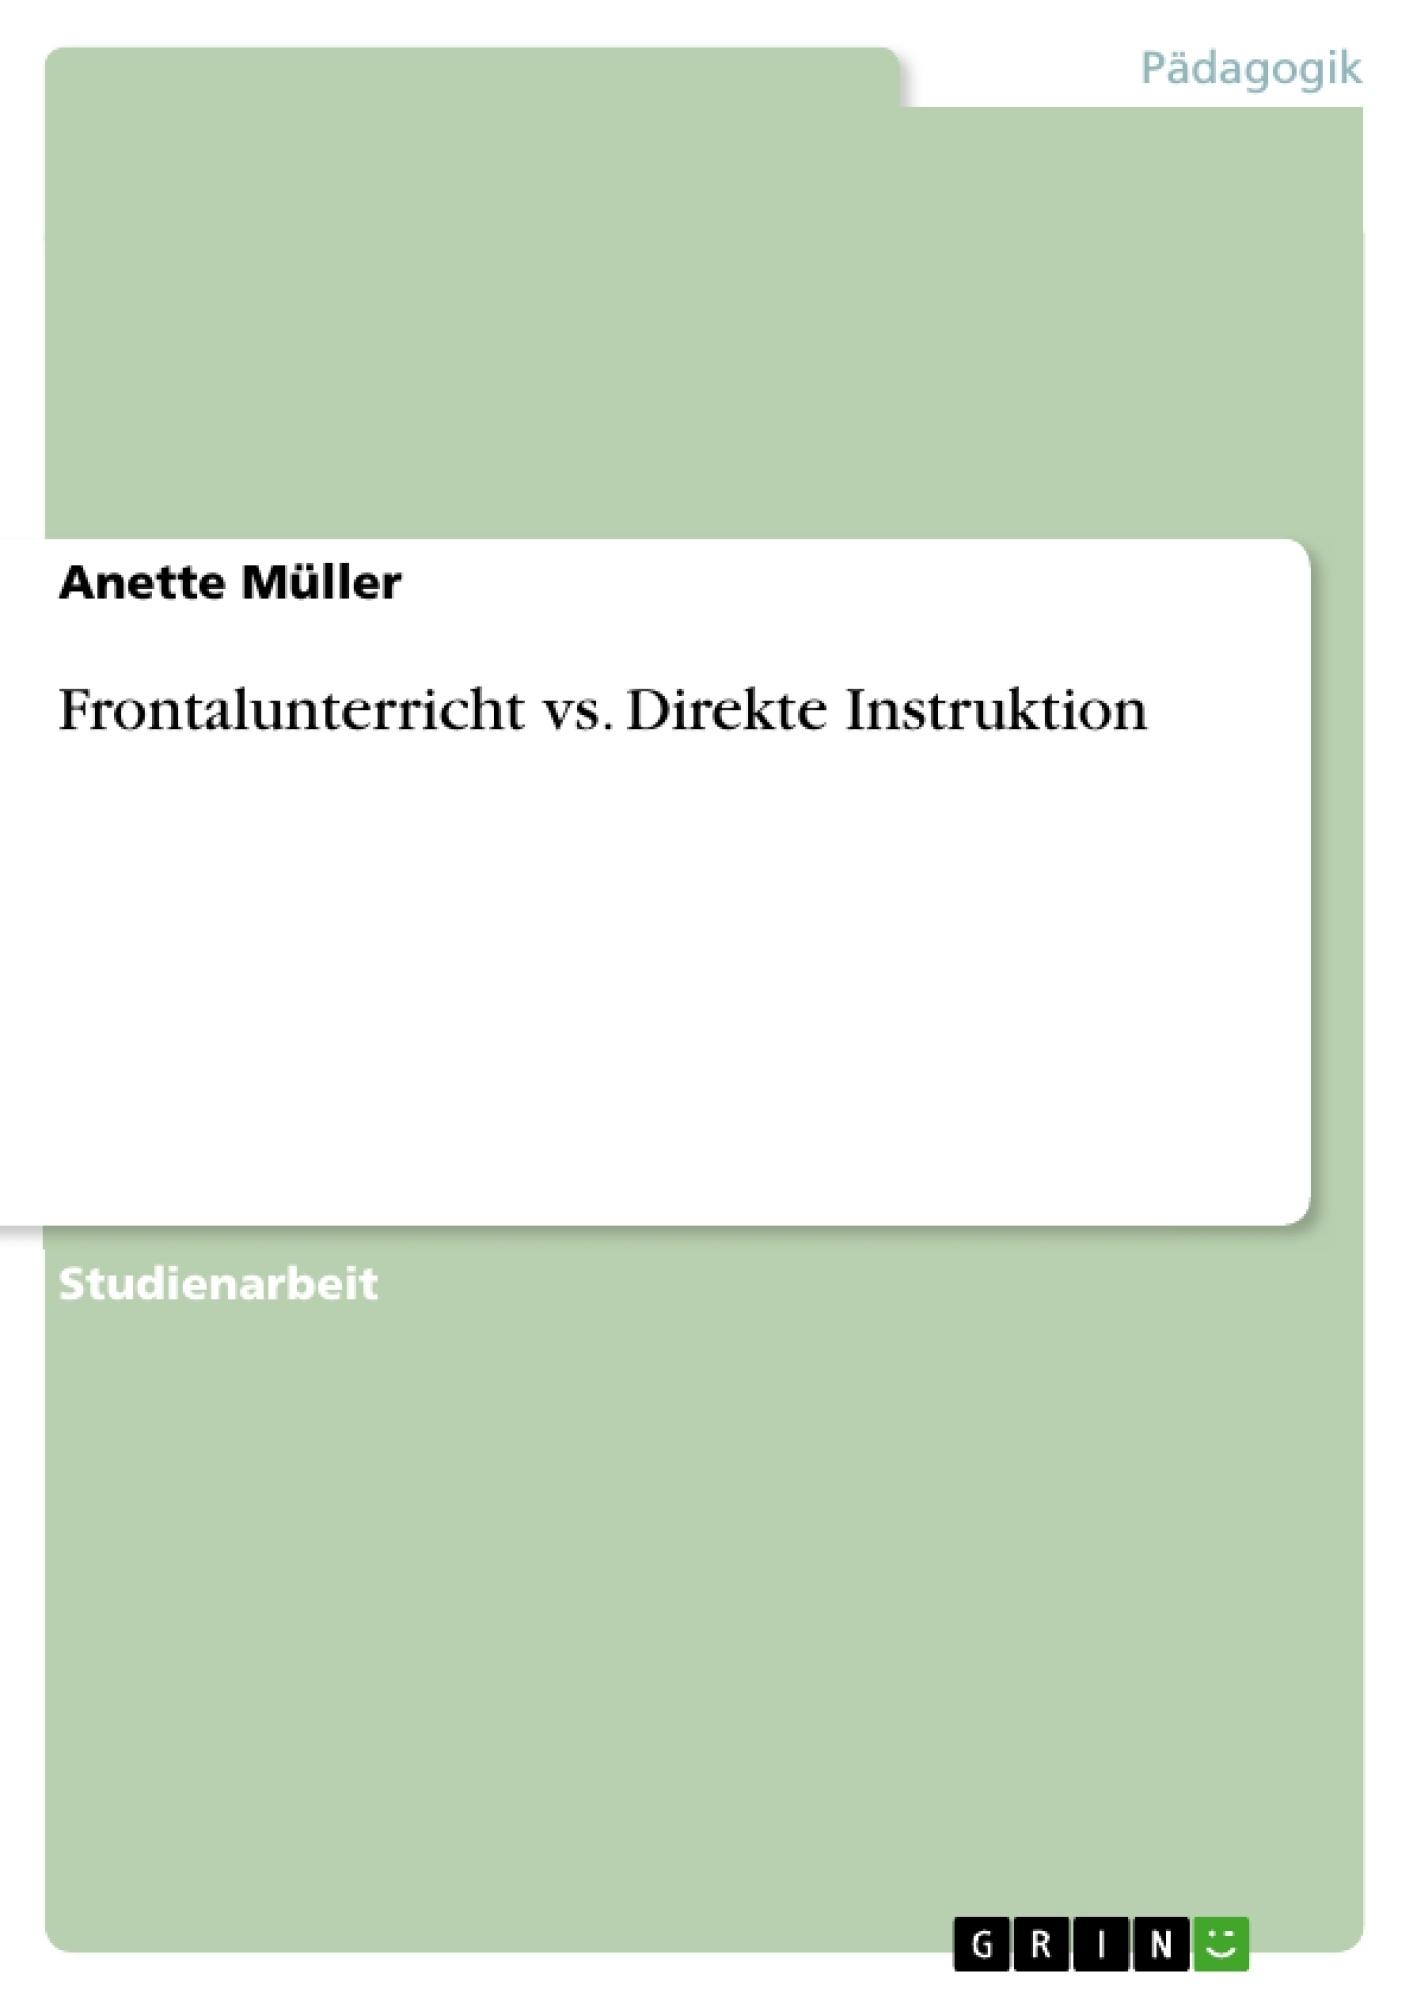 Titel: Frontalunterricht vs. Direkte Instruktion